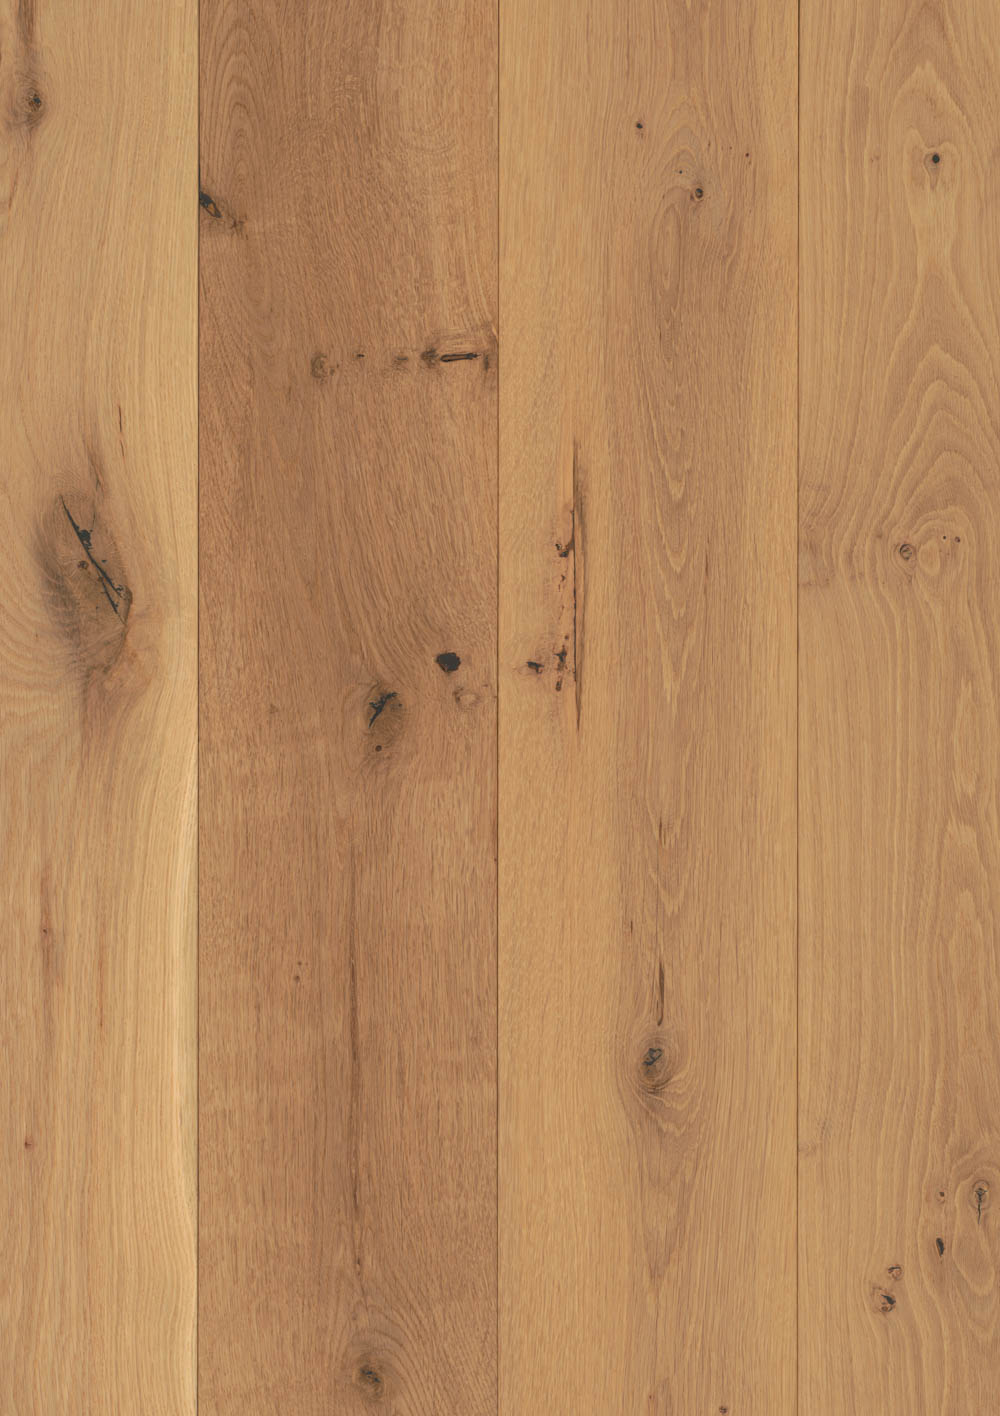 Hudson Company Center Cut White Oak planking in detail.